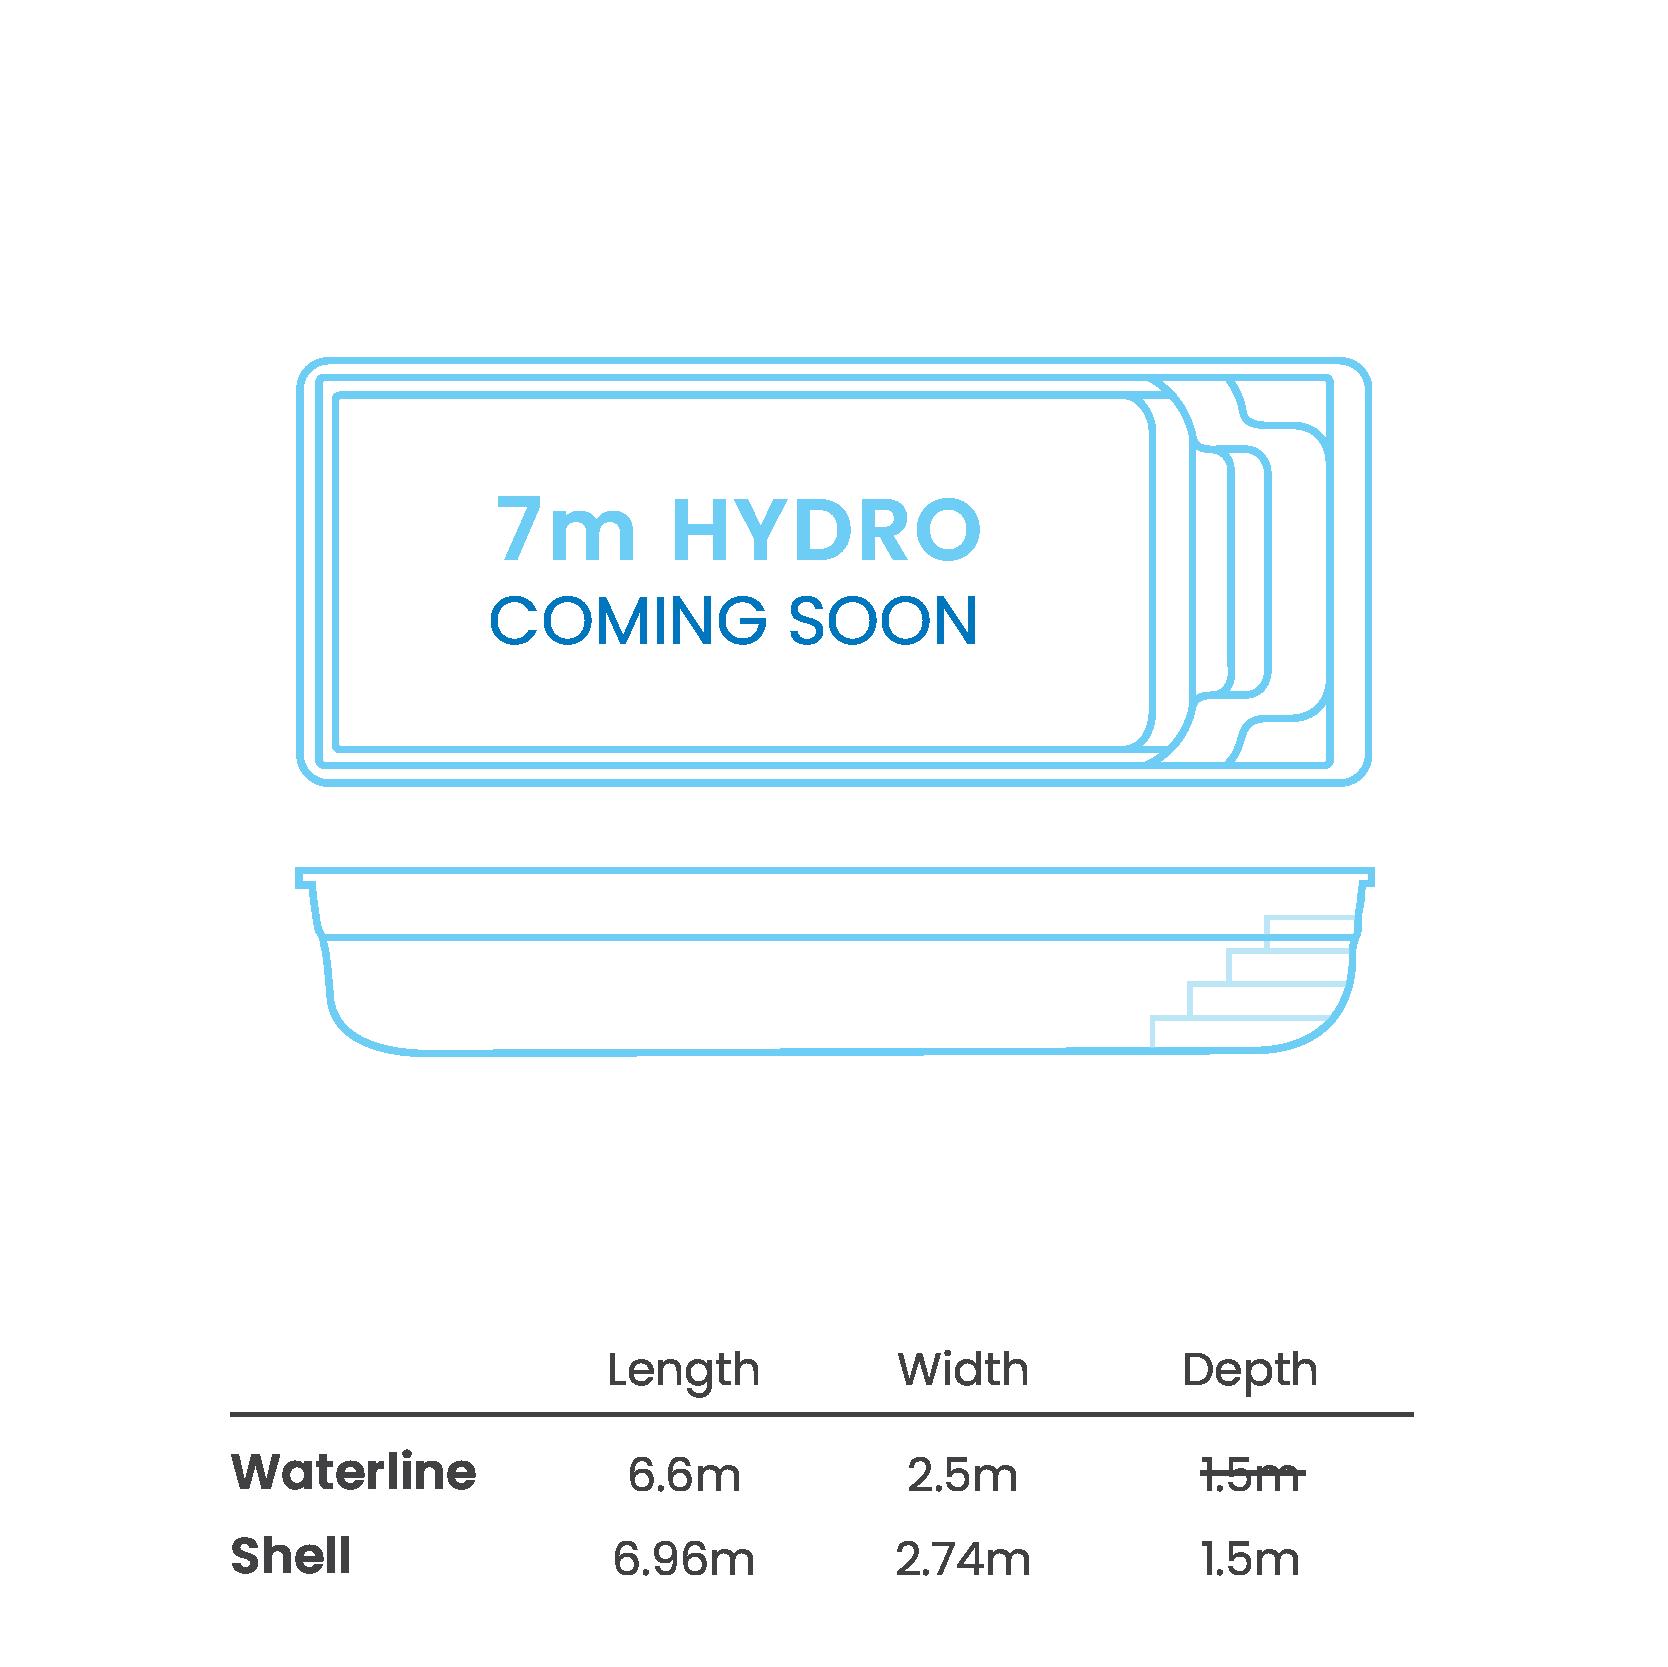 Hydro-7m-Coming-Soon